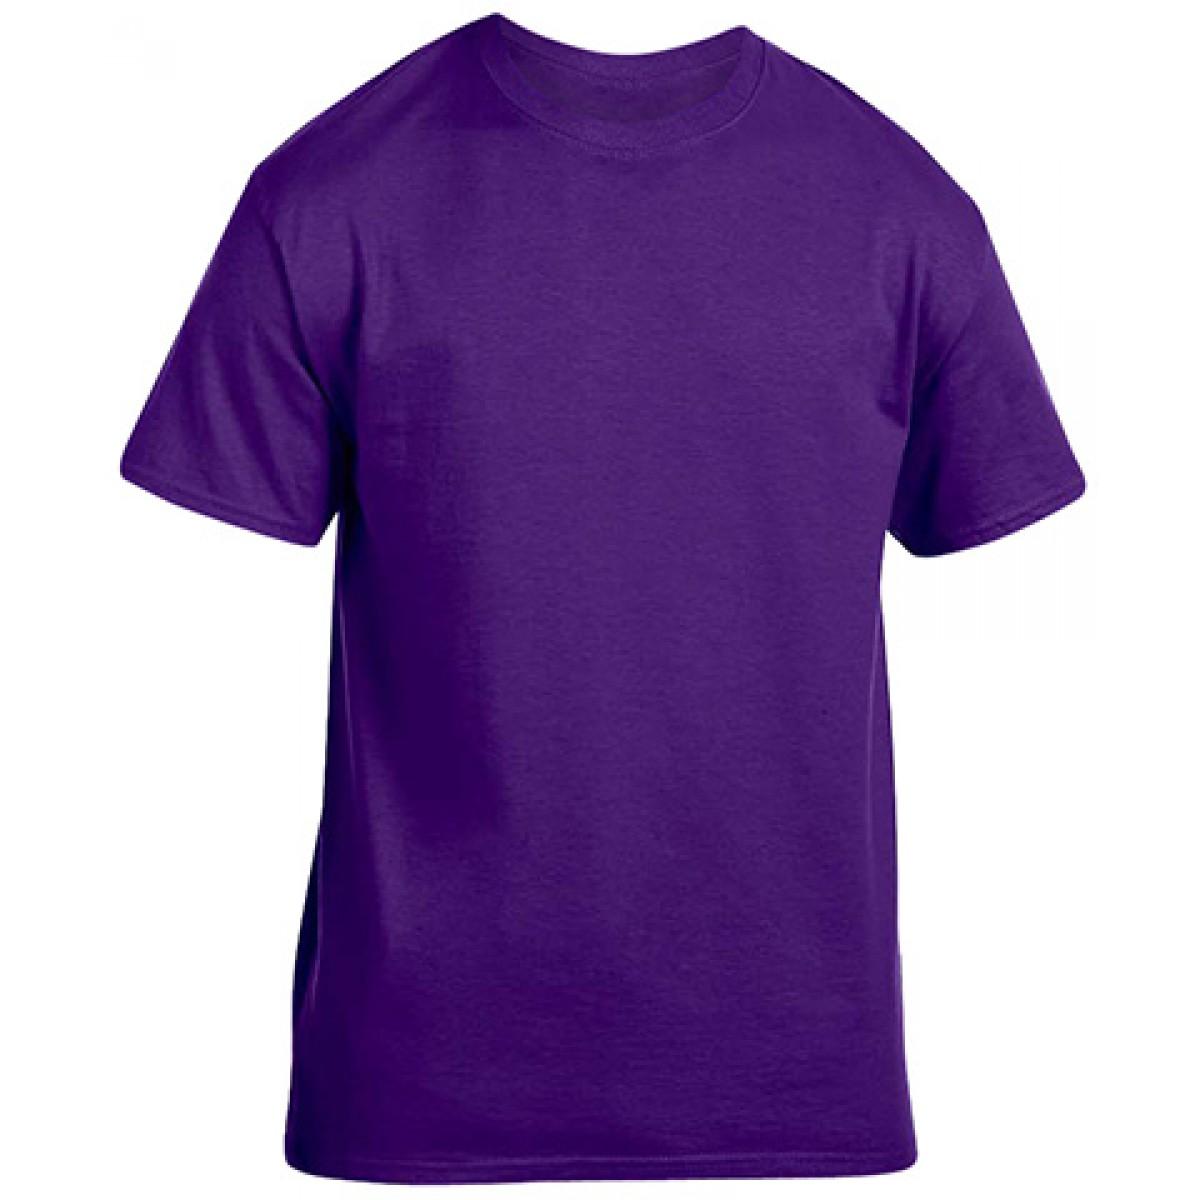 Soft 100% Cotton T-Shirt-Purple-3XL